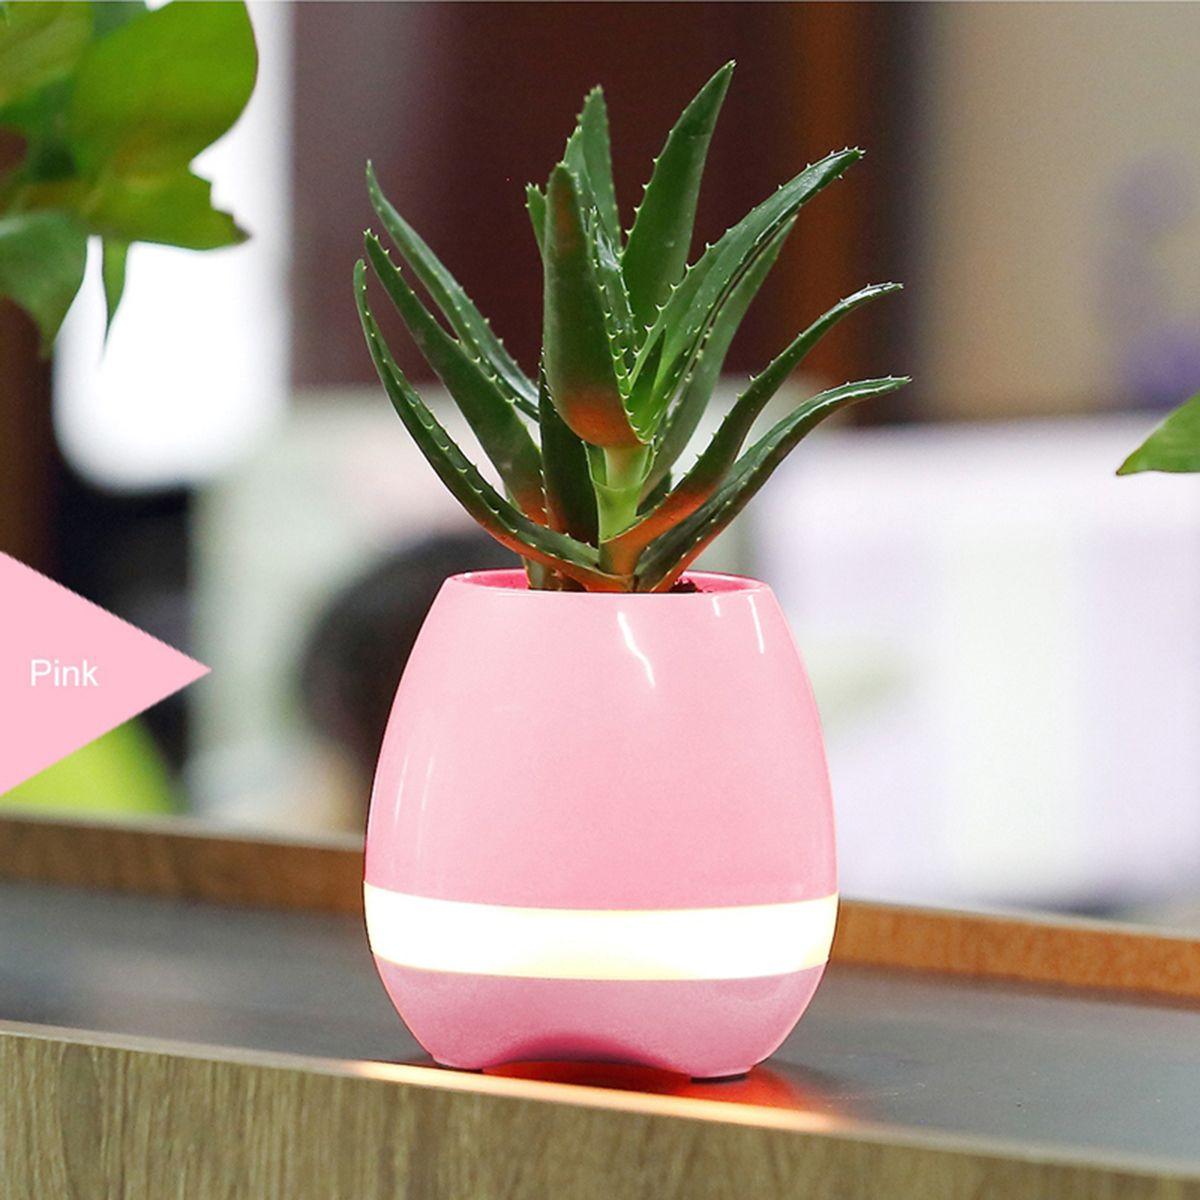 Smart Music Flower Pots Bluetooth Speakers Home Office Decor